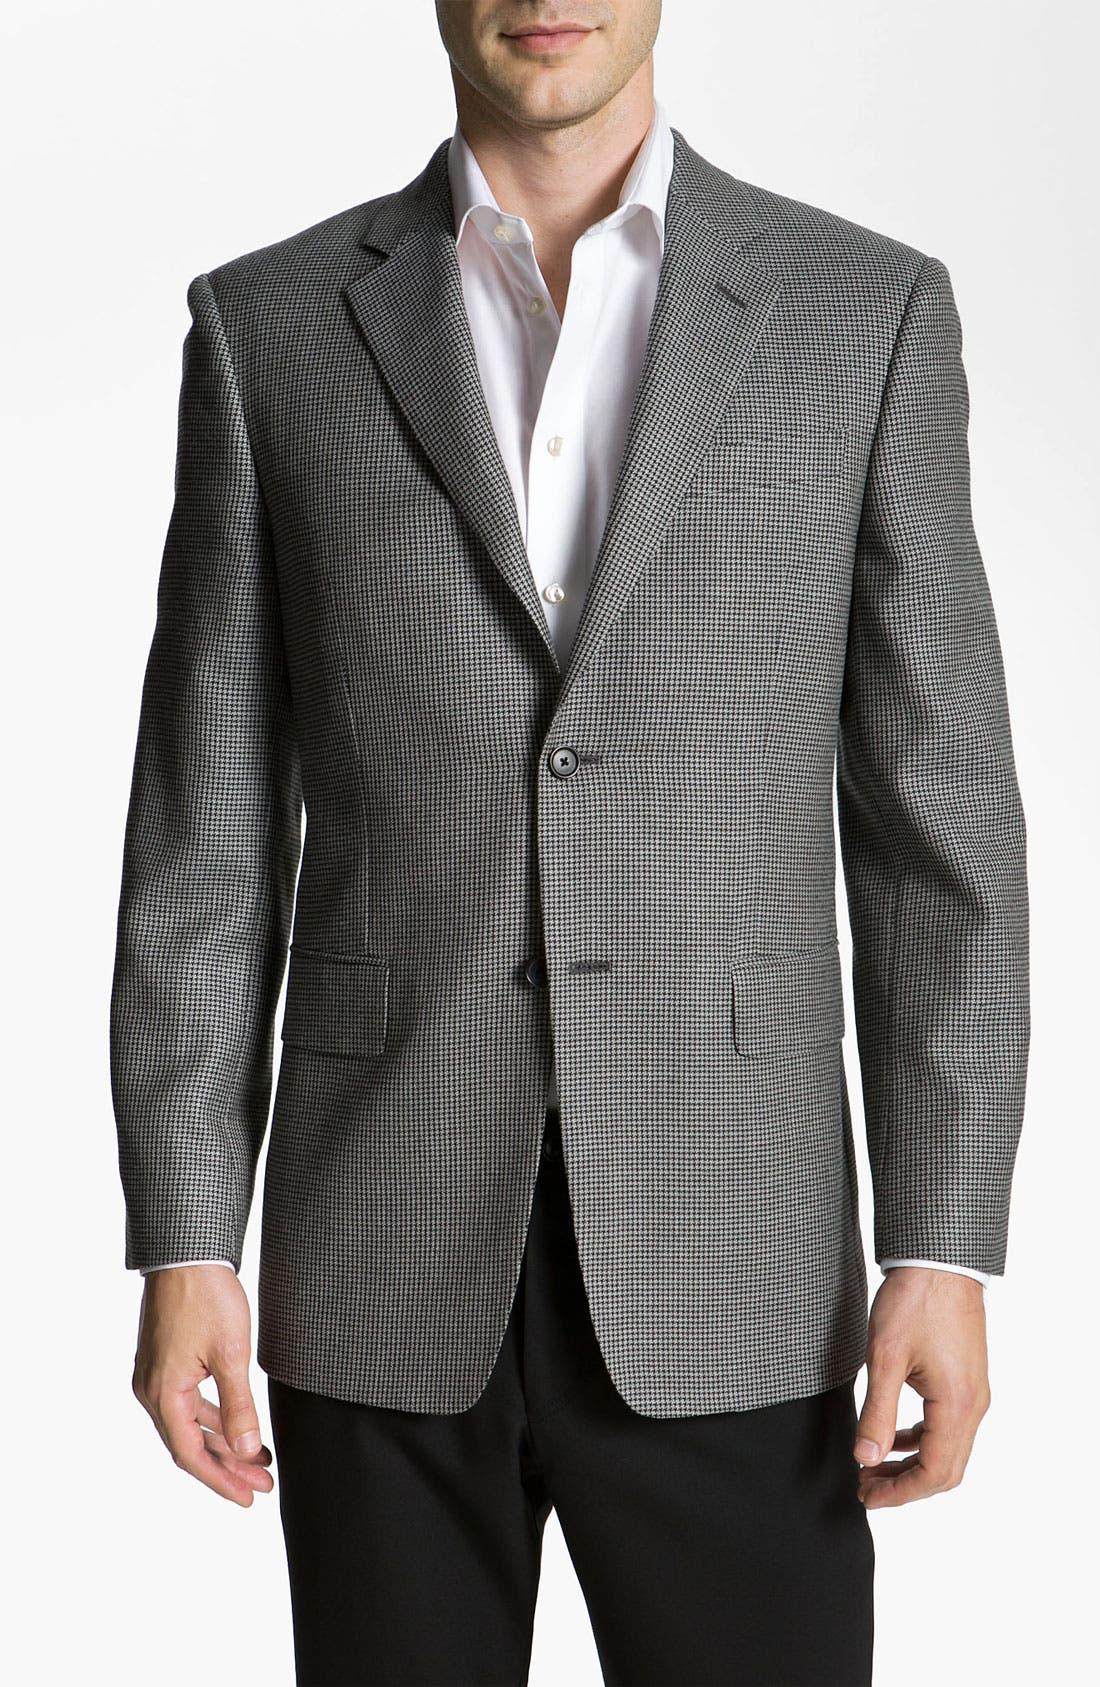 Main Image - John W. Nordstrom® Houndstooth Sportcoat